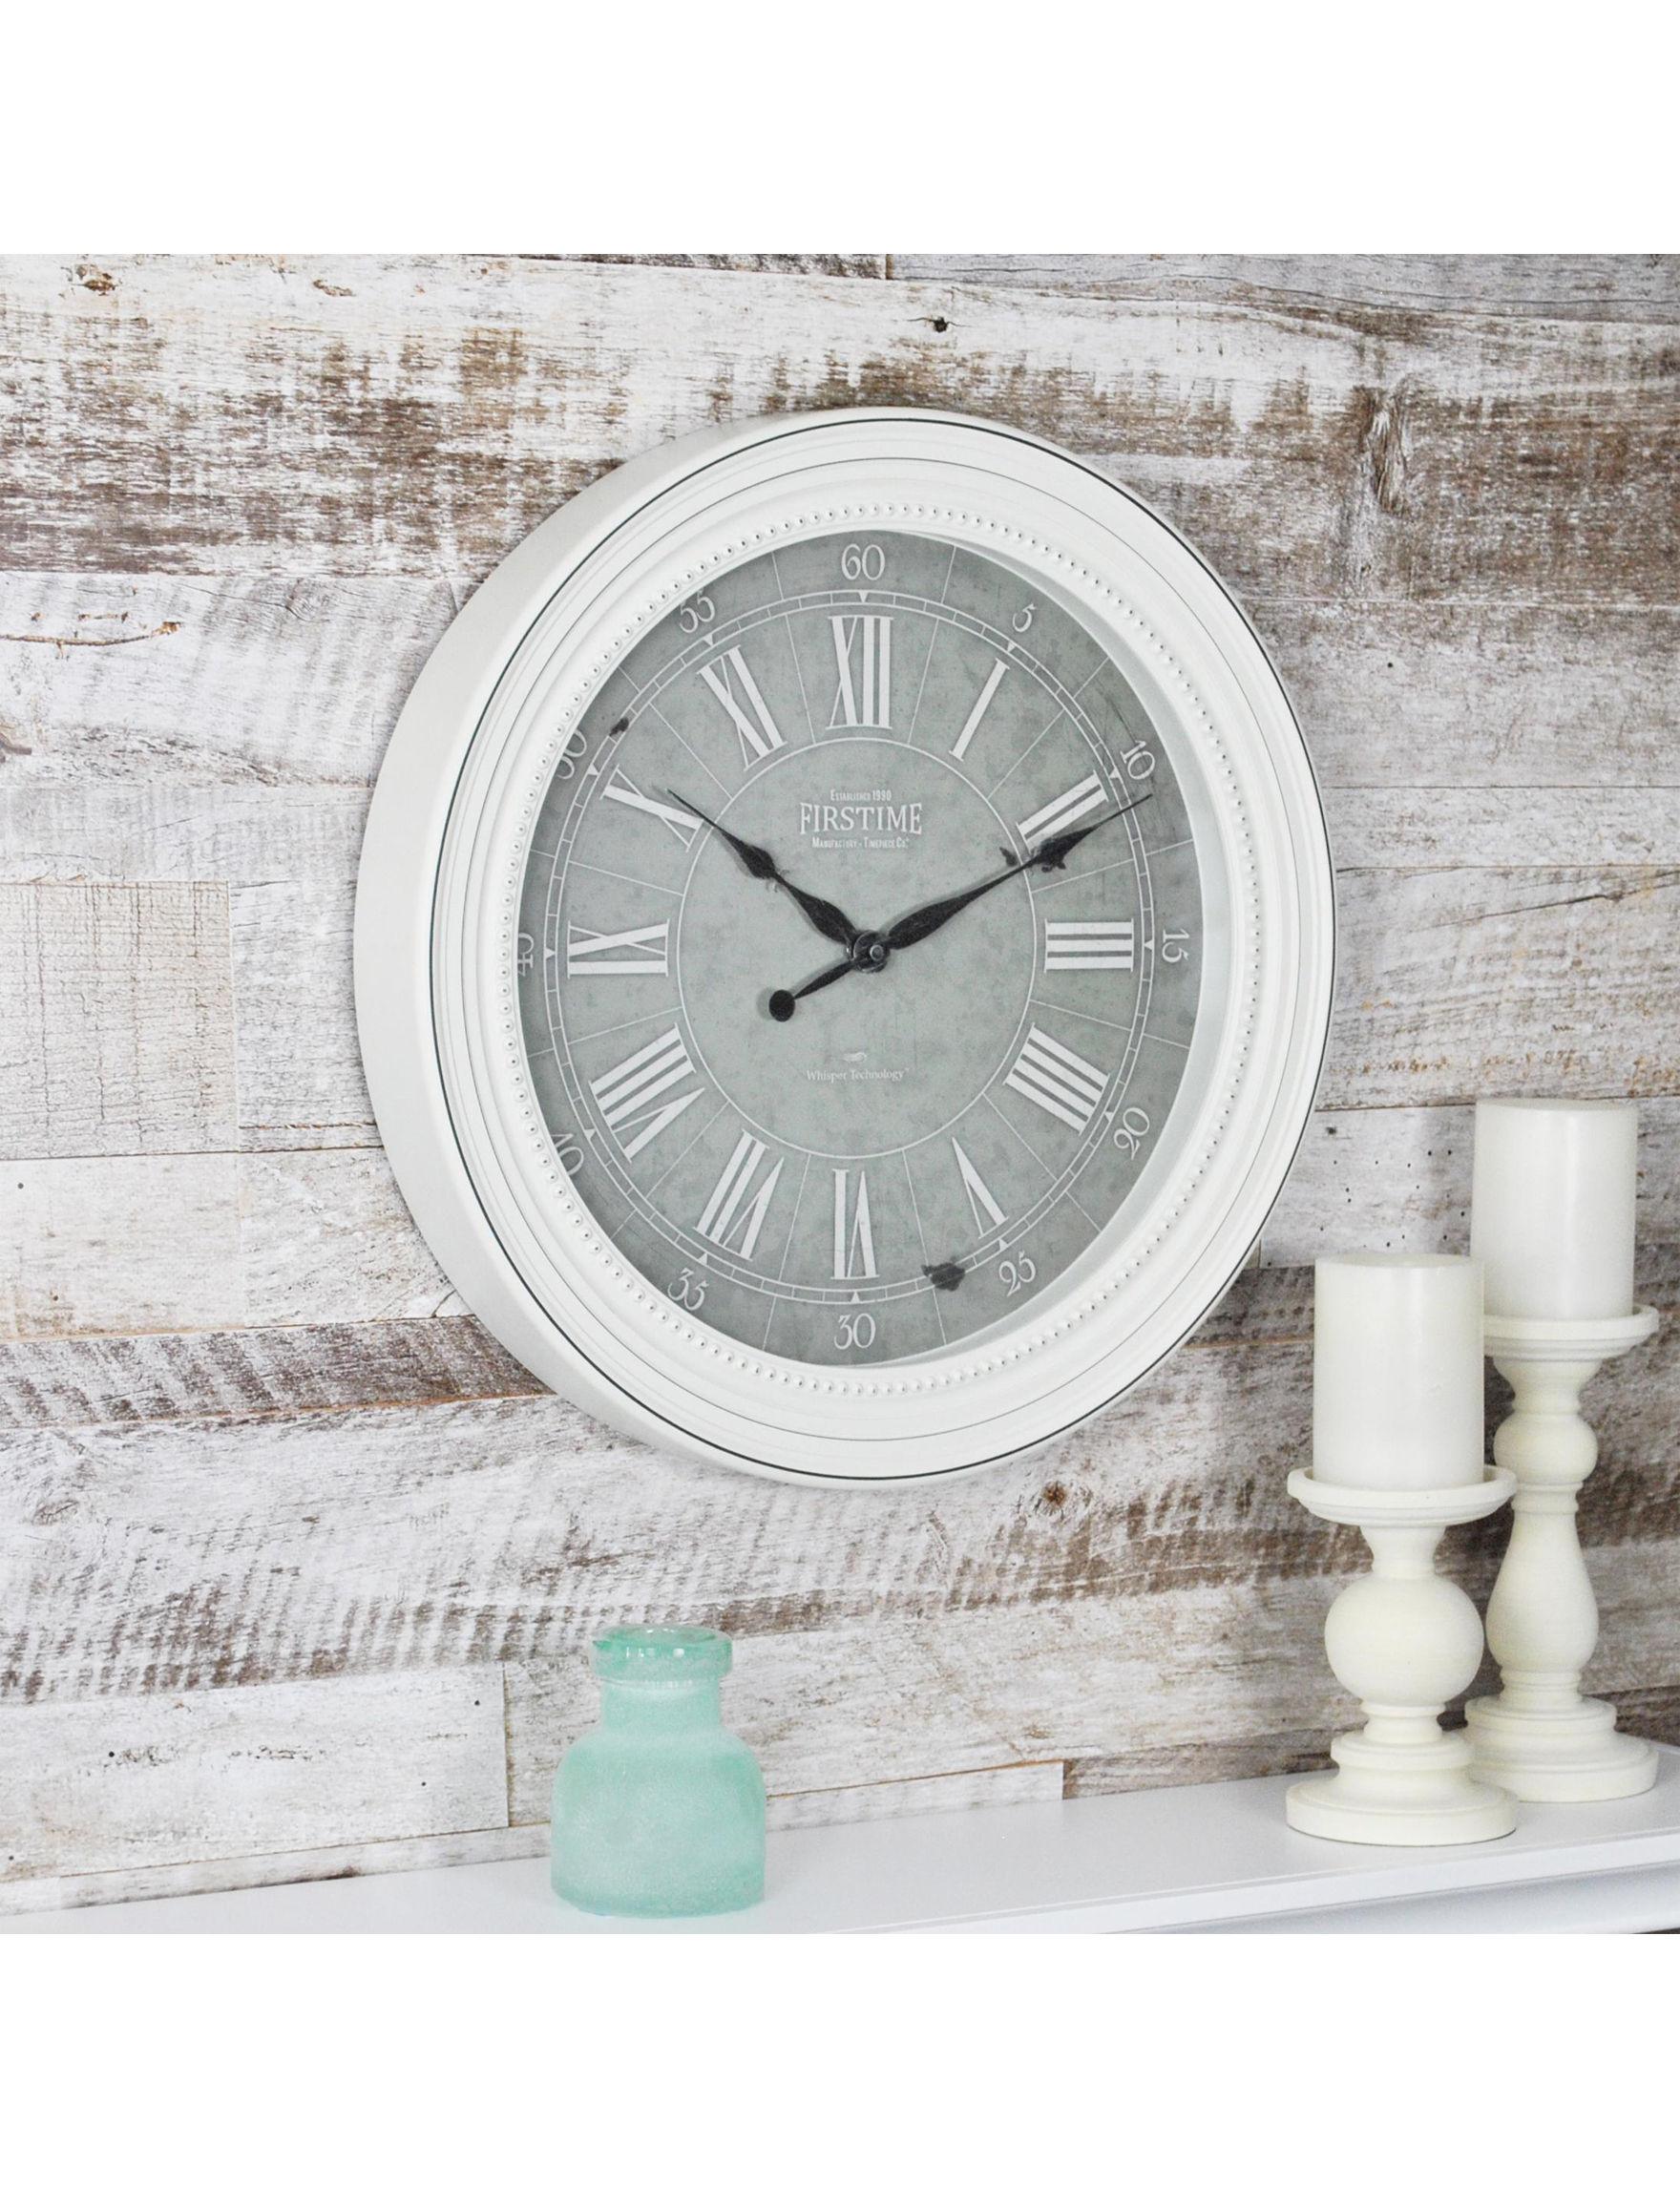 Firstime Manufactory White Wall Clocks Wall Decor